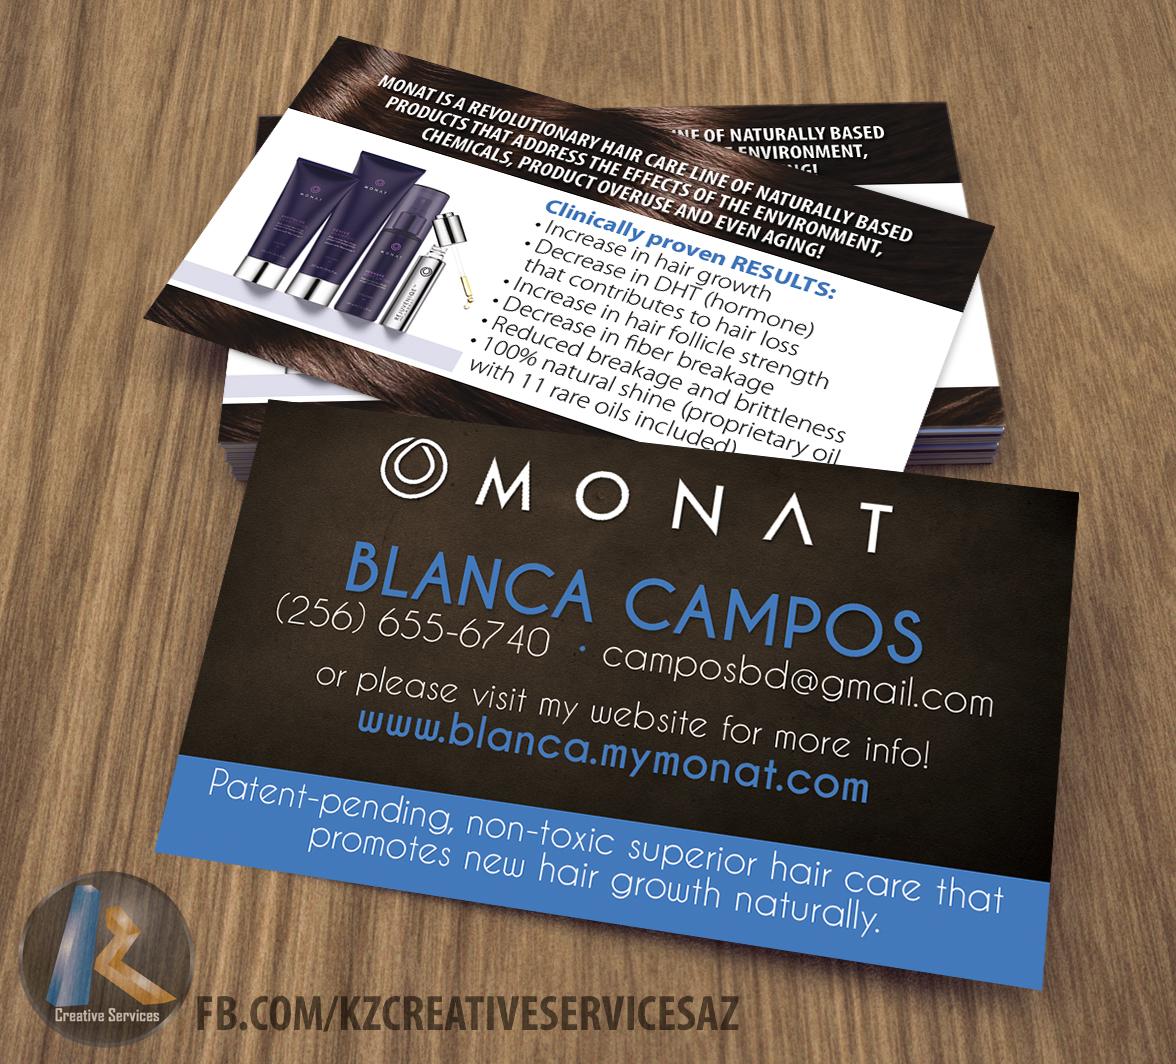 Monat Business Cards Style 2 Kz Creative Services Online Store